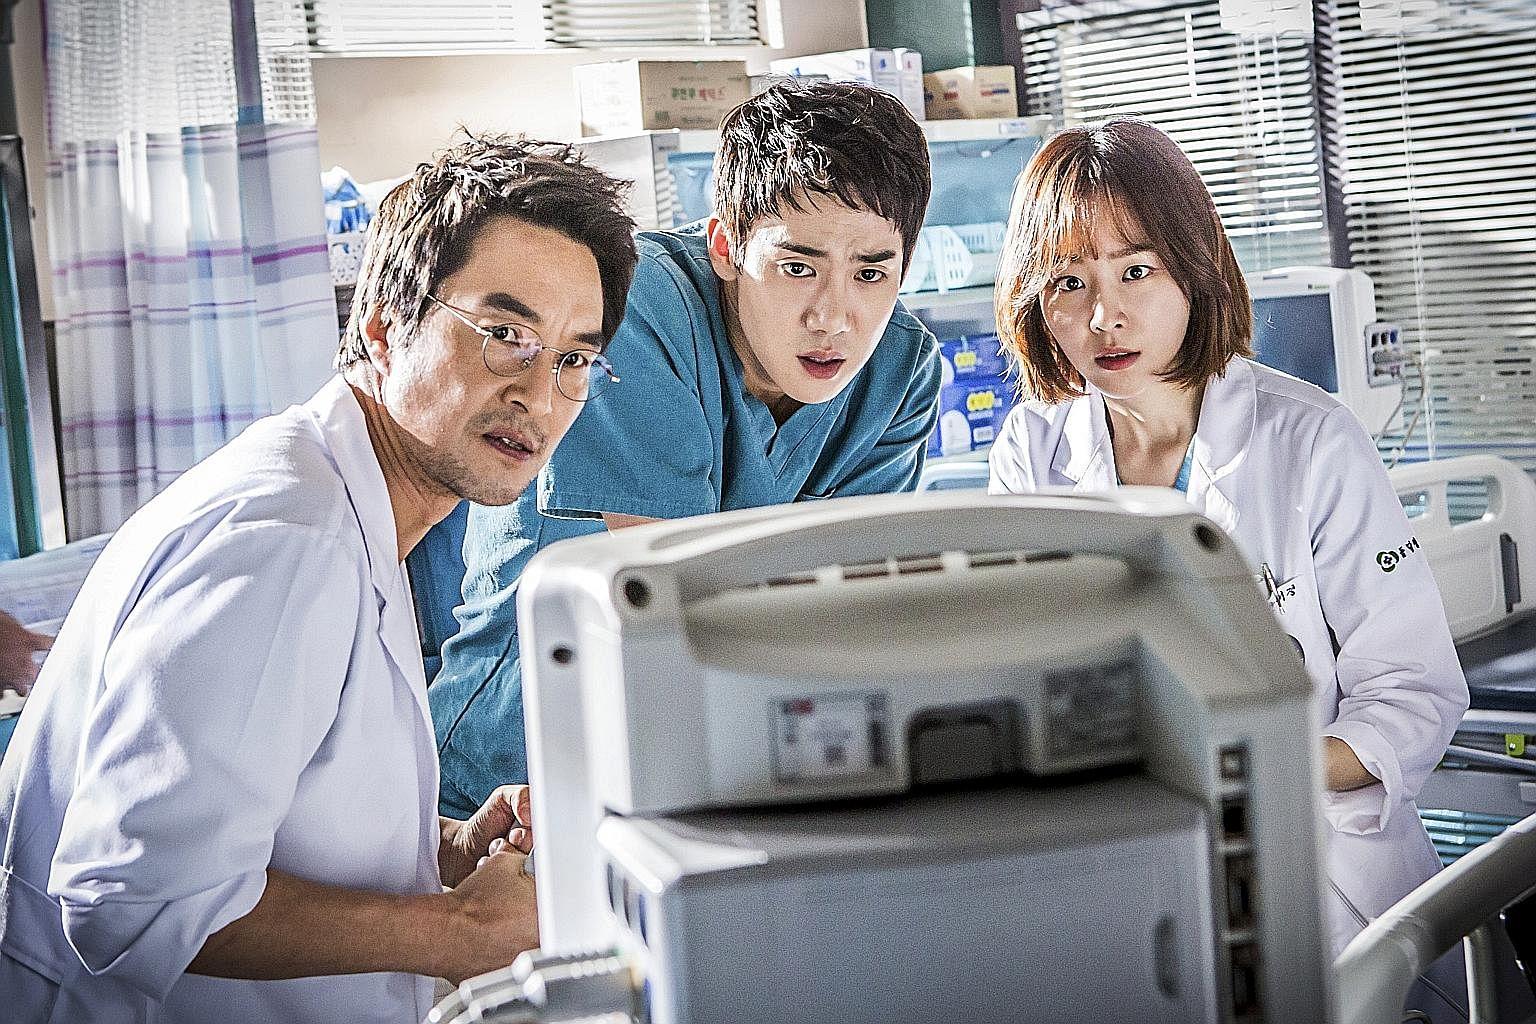 Legend Of The Blue Sea's Lee Min Ho and Gianna Jun; and Romantic Doctor, Teacher Kim's (from far left) Han Seok Kyu, Yoo Yeon Seok and Seo Hyun Jin.